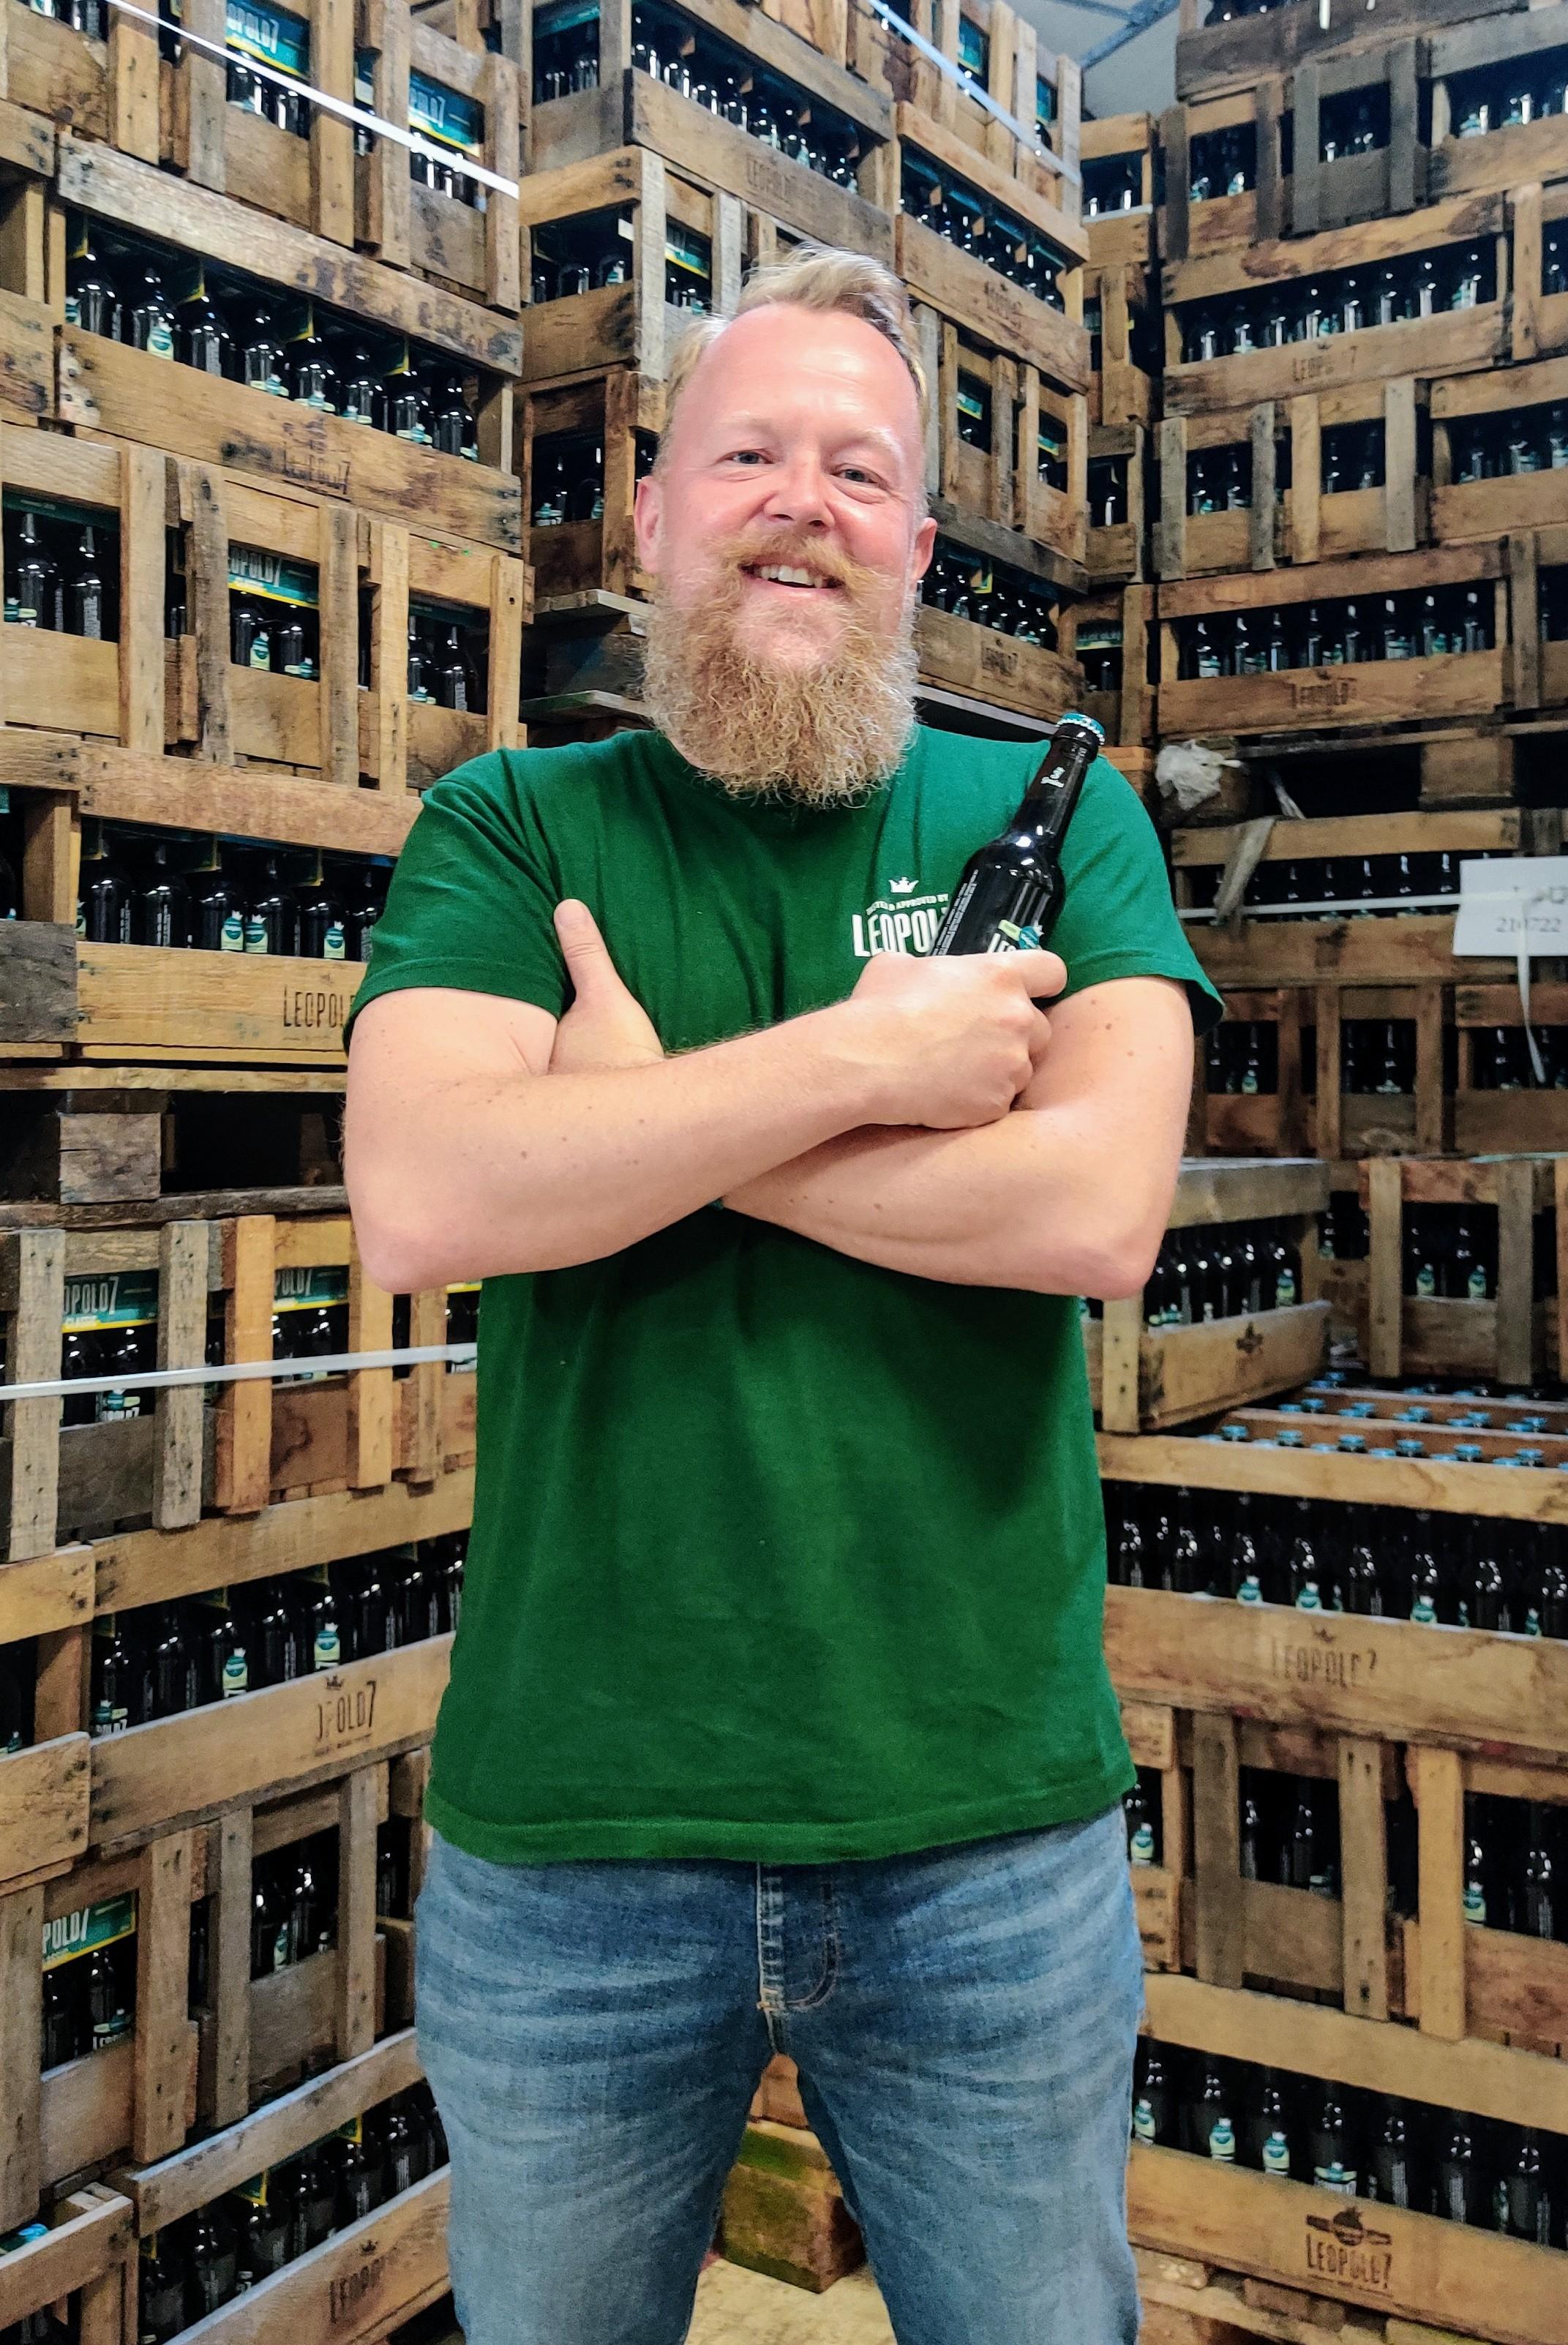 Olivier Van Hulsel, Directeur de la Brasserie Léopold 7